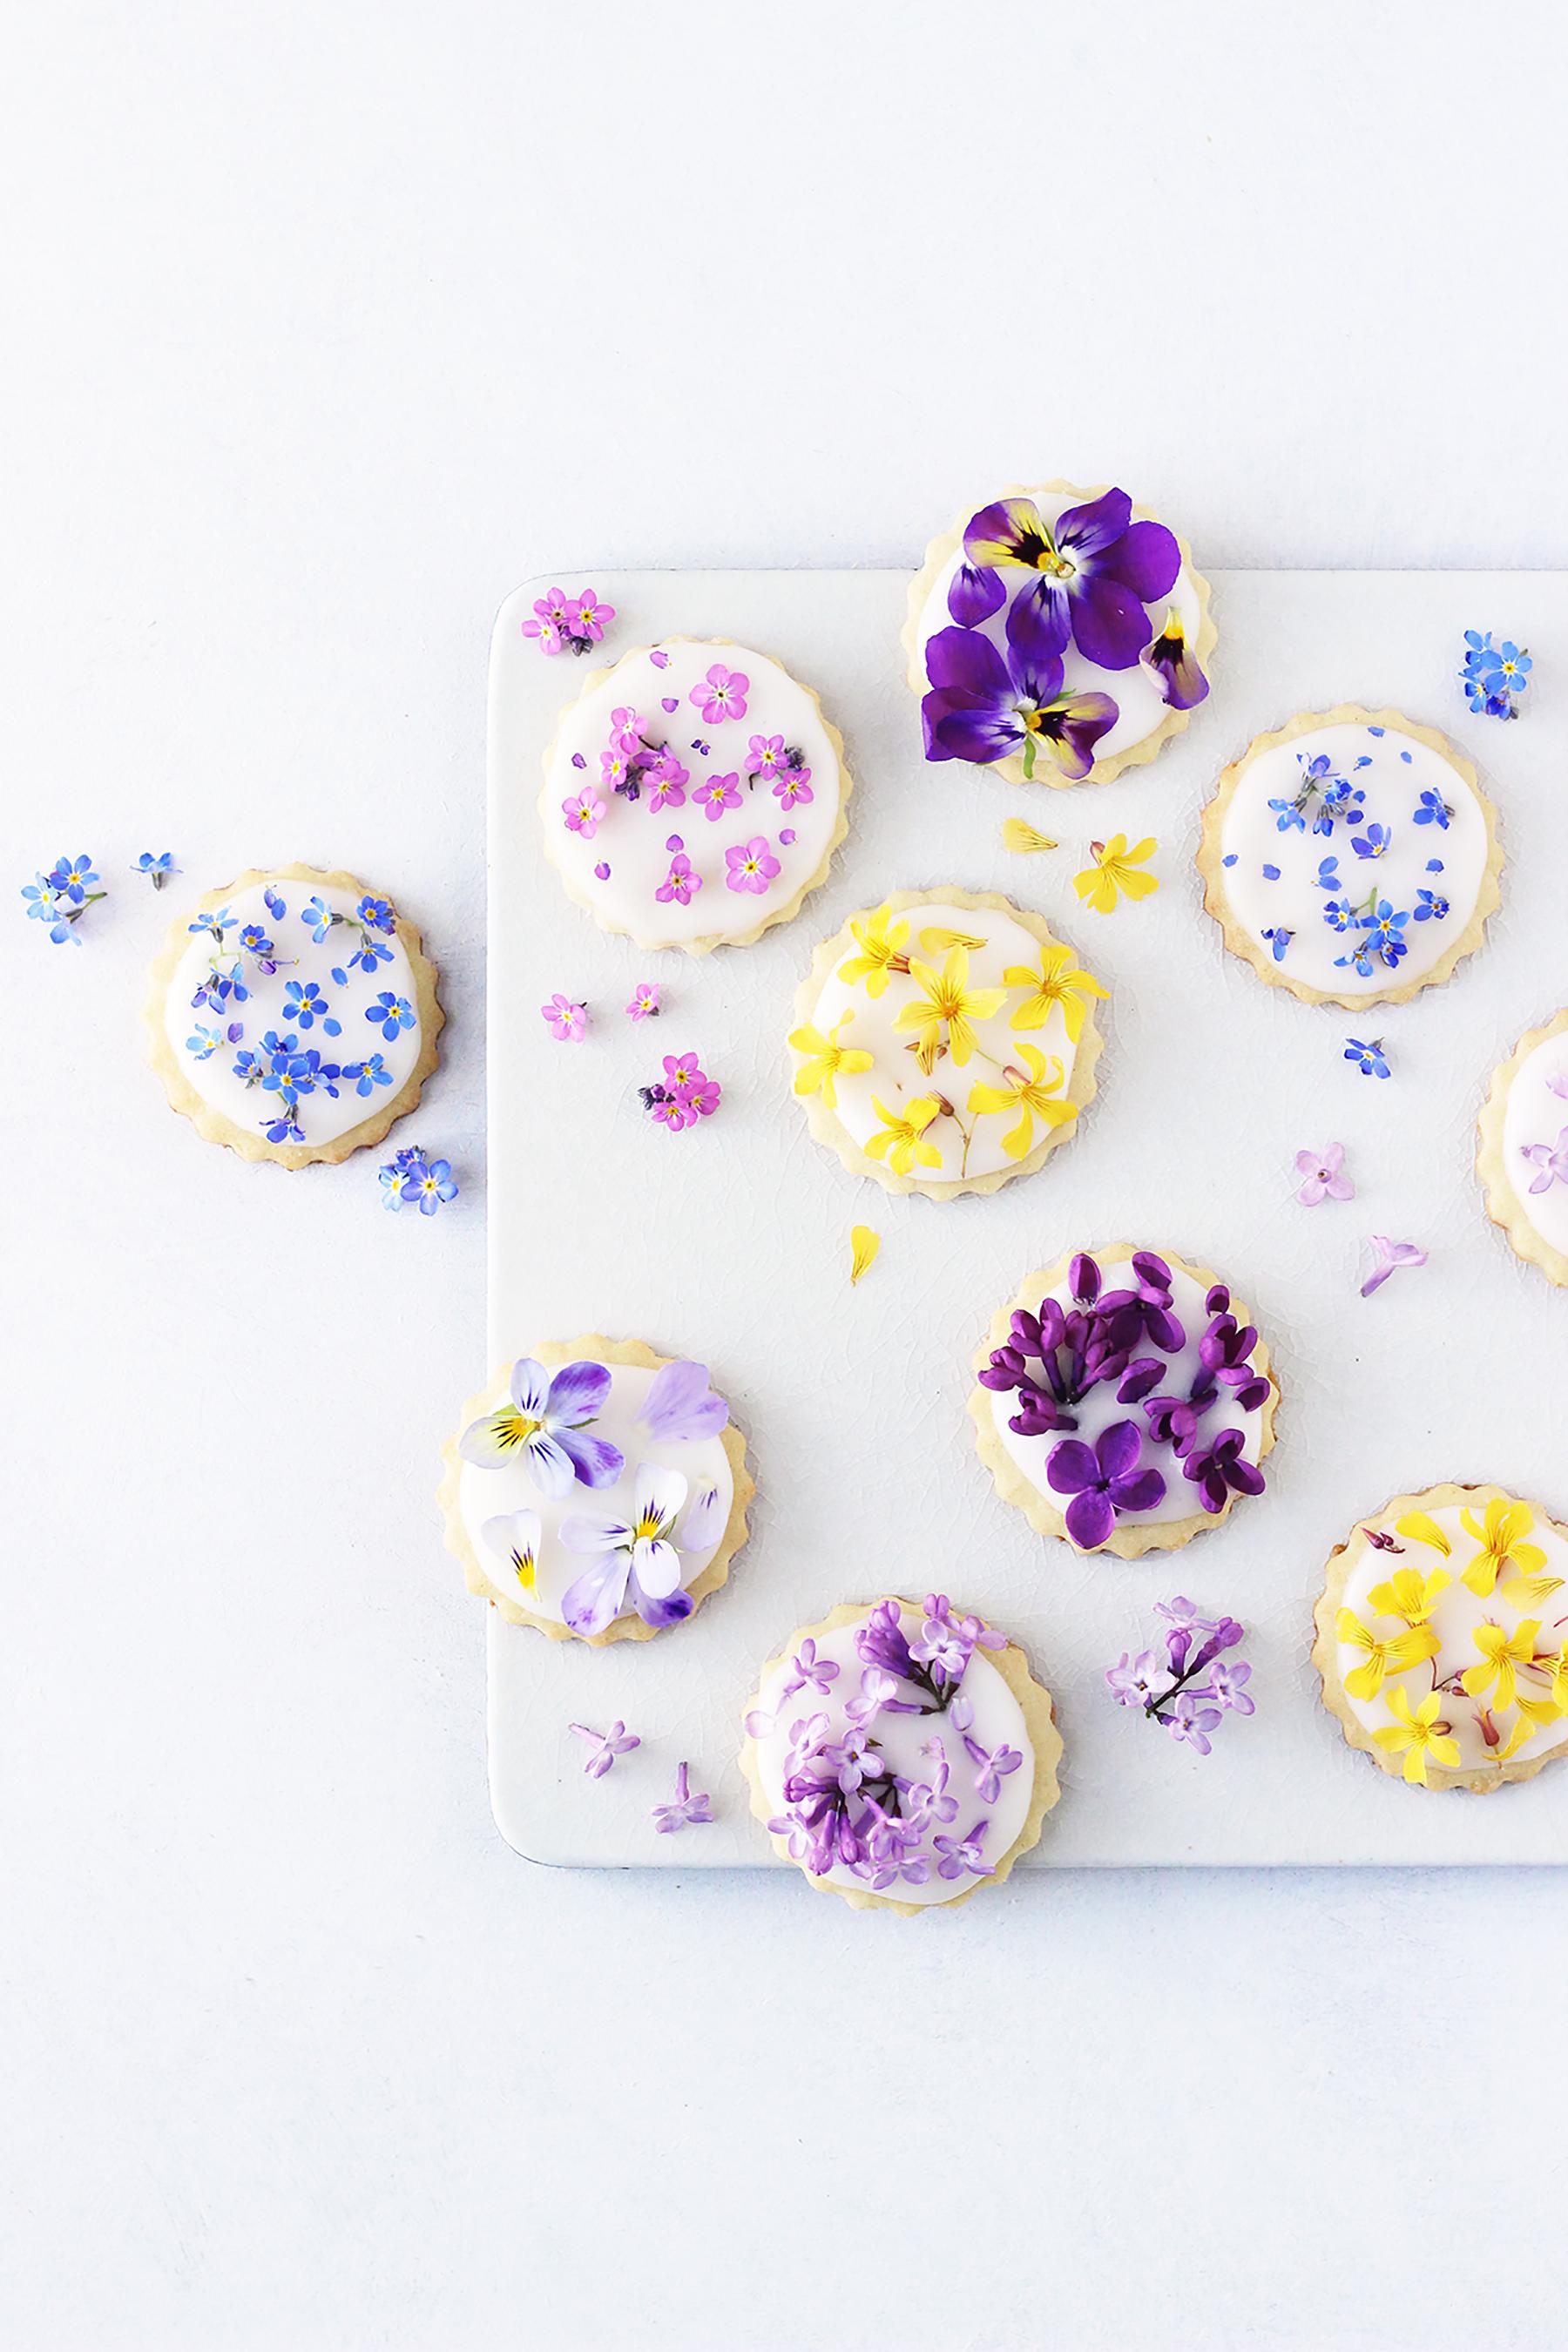 Småkager med spiselige blomster